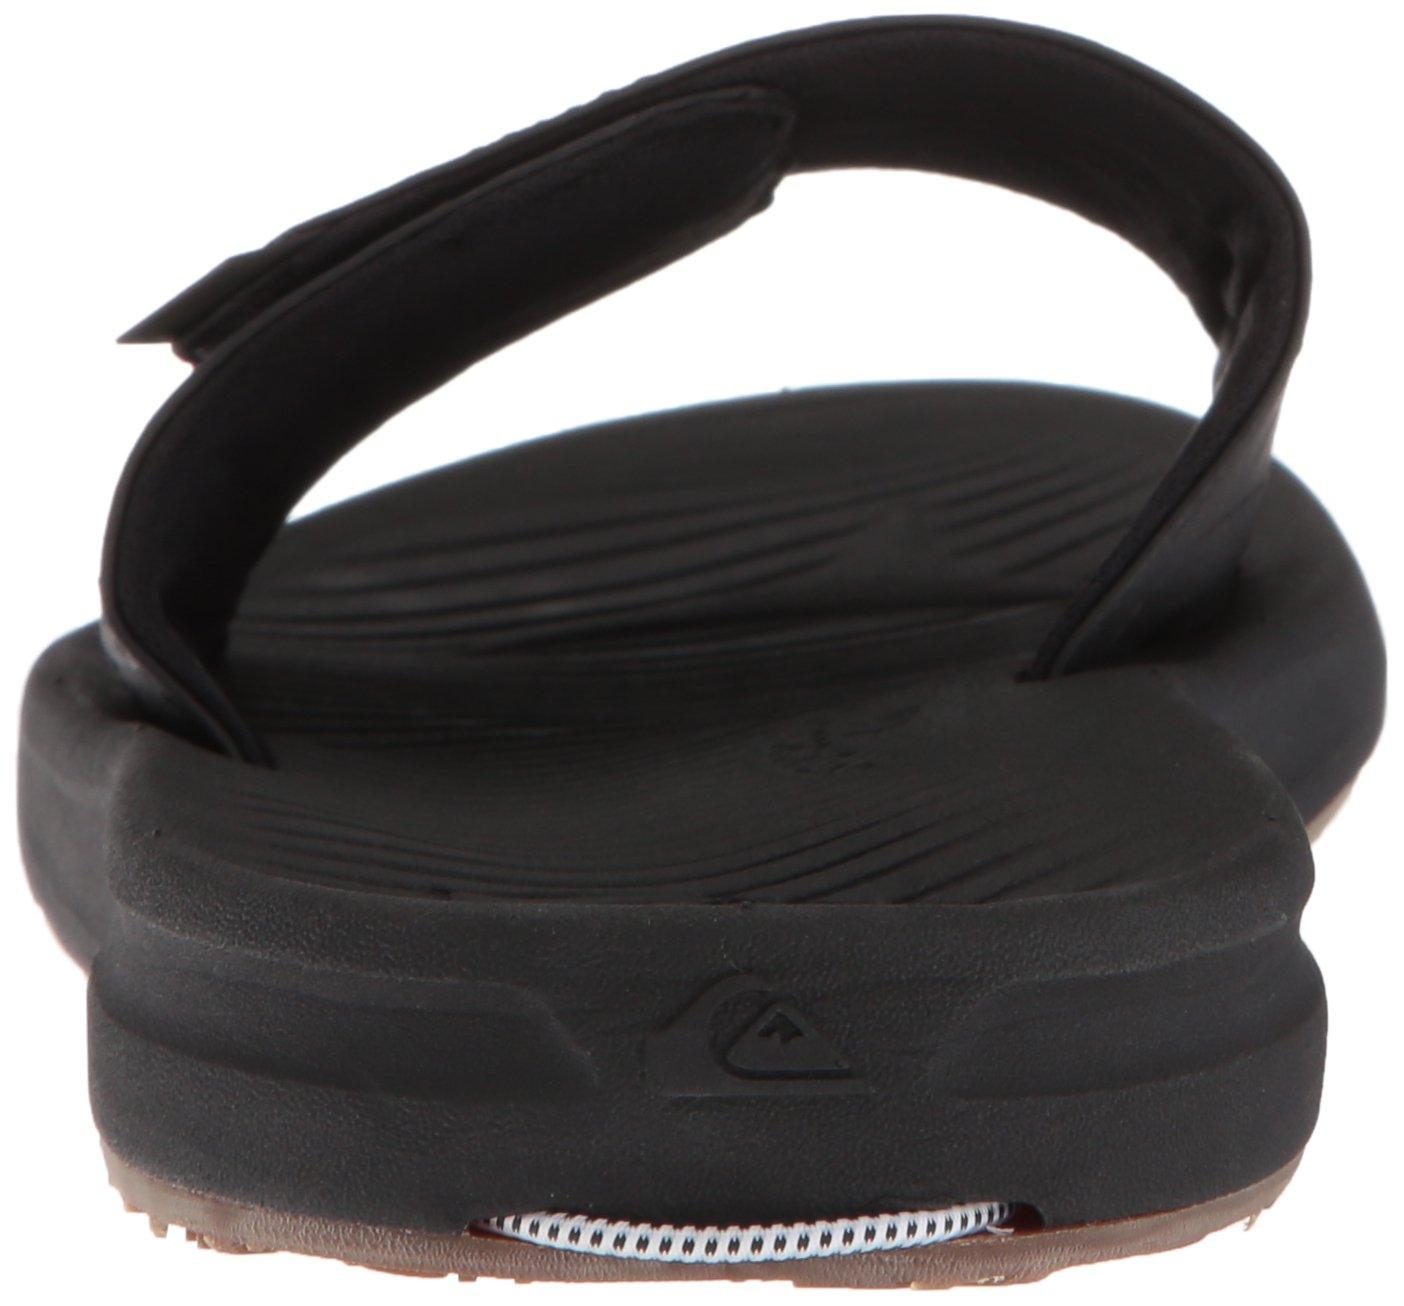 Quiksilver Men's Travel Oasis Slide Sandal, Black/Black/Brown, 8(41) M US by Quiksilver (Image #2)